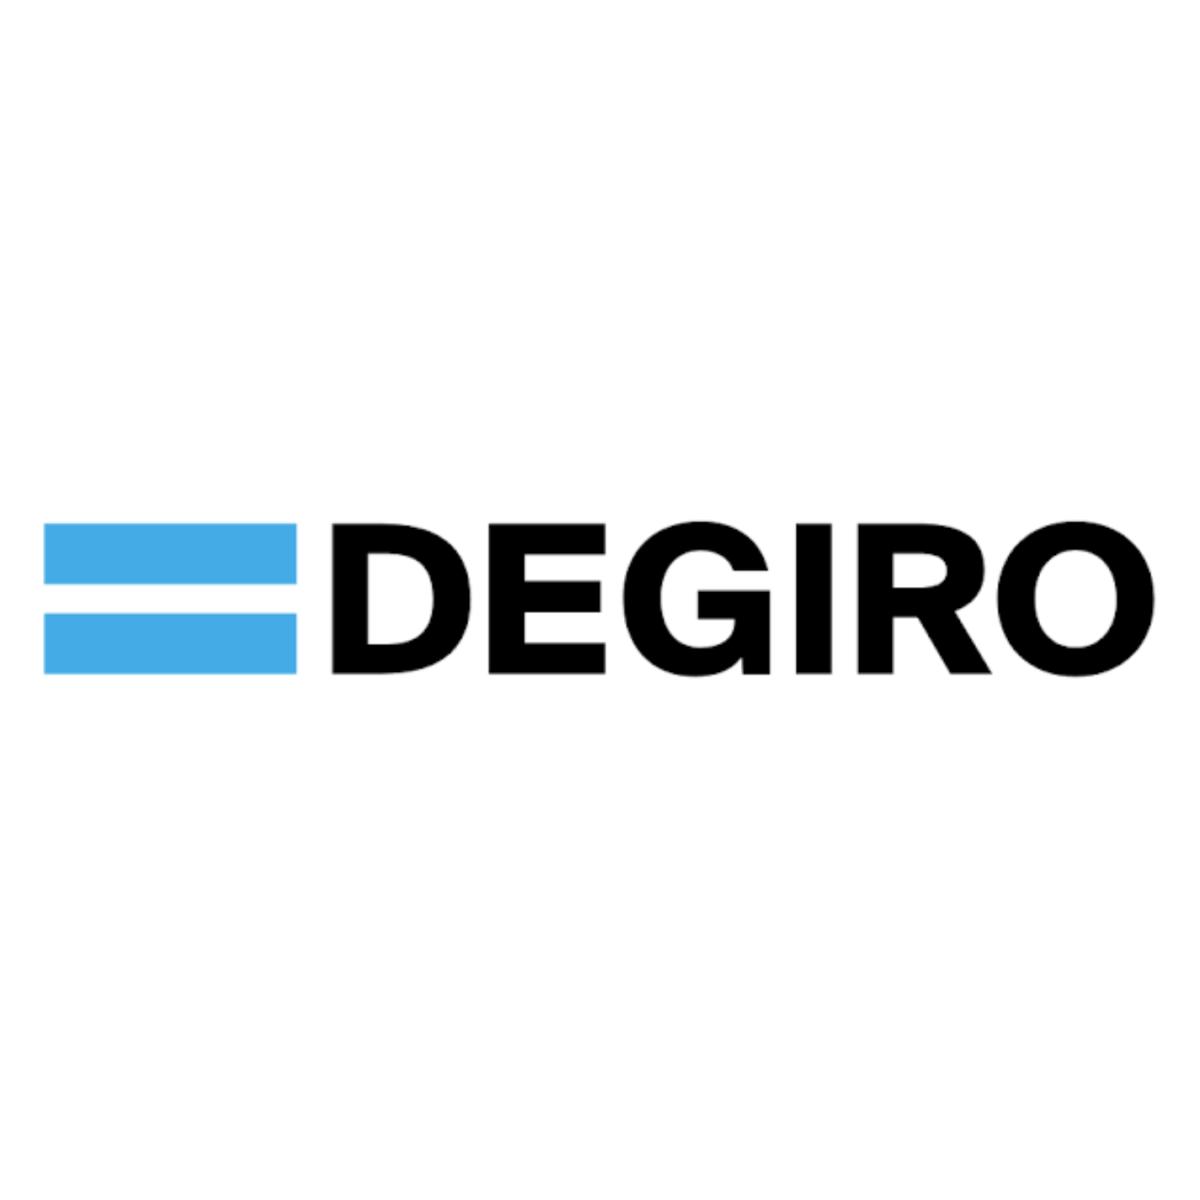 DeGiro Logo @ Savings4Freedom